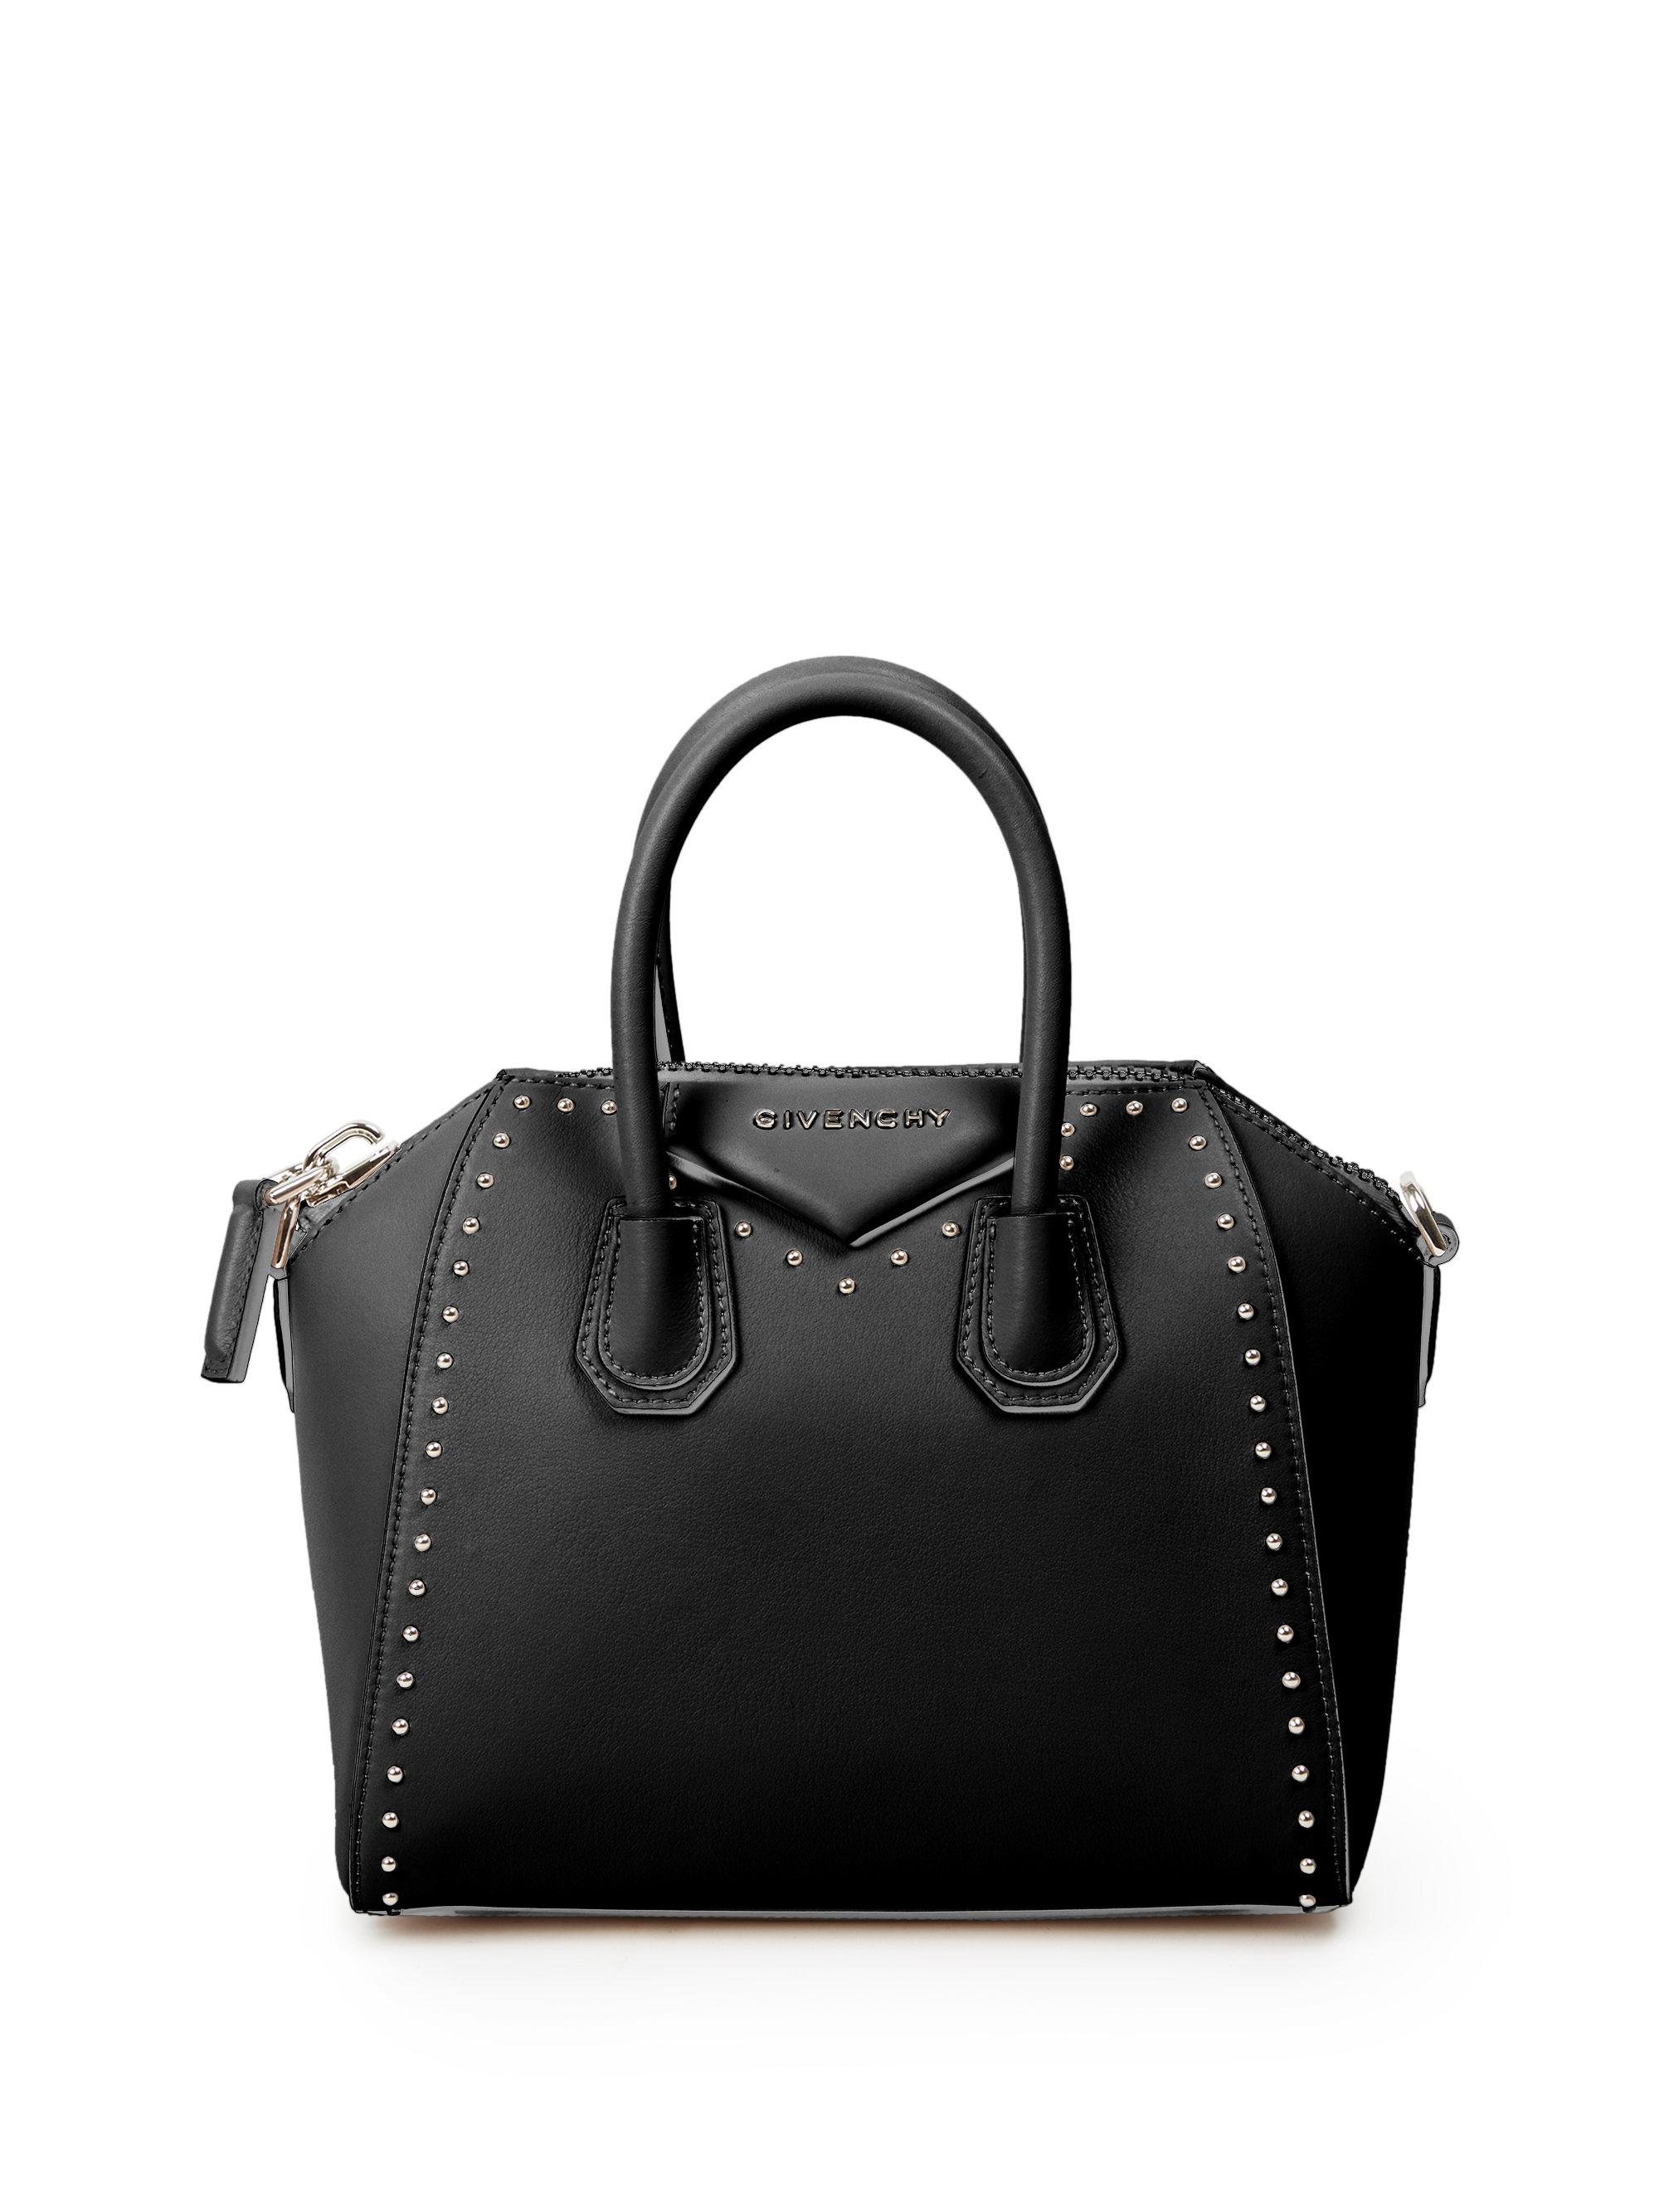 lyst givenchy antigona mini studded leather satchel in black. Black Bedroom Furniture Sets. Home Design Ideas